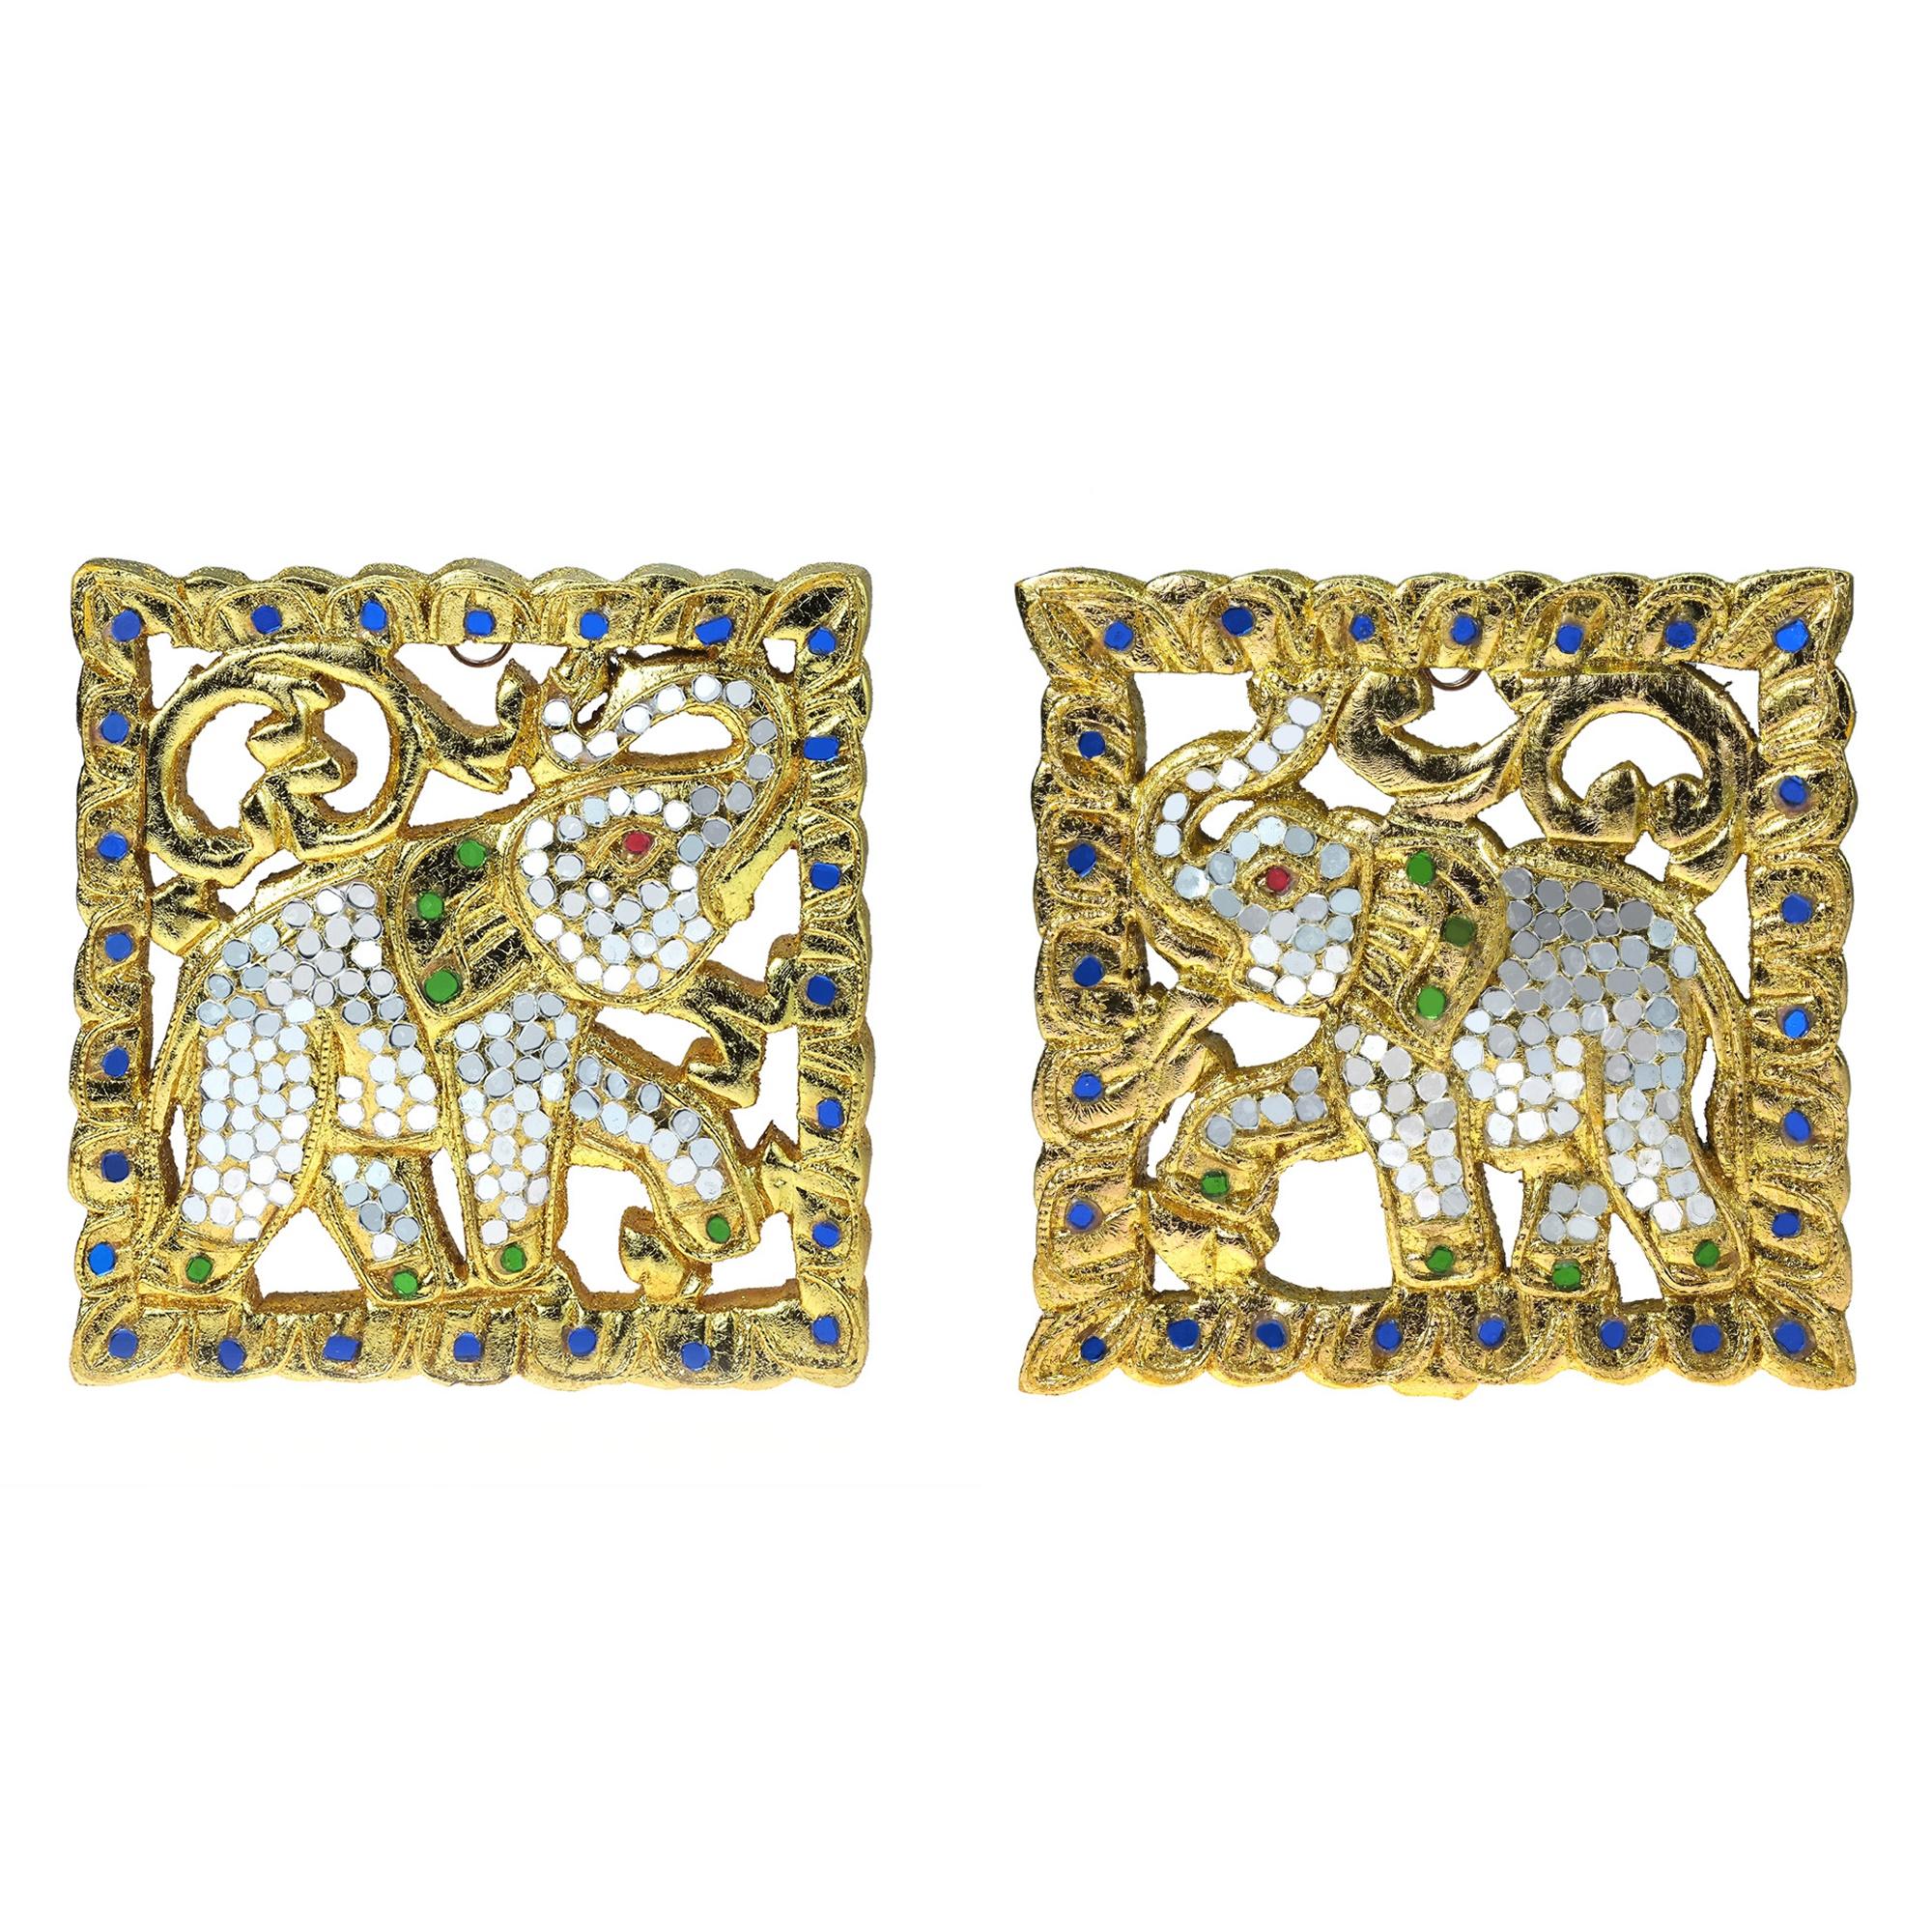 Set of Two Thai Elephant Gilded 24k Gold Leaf Mosaic Carved Wood ...